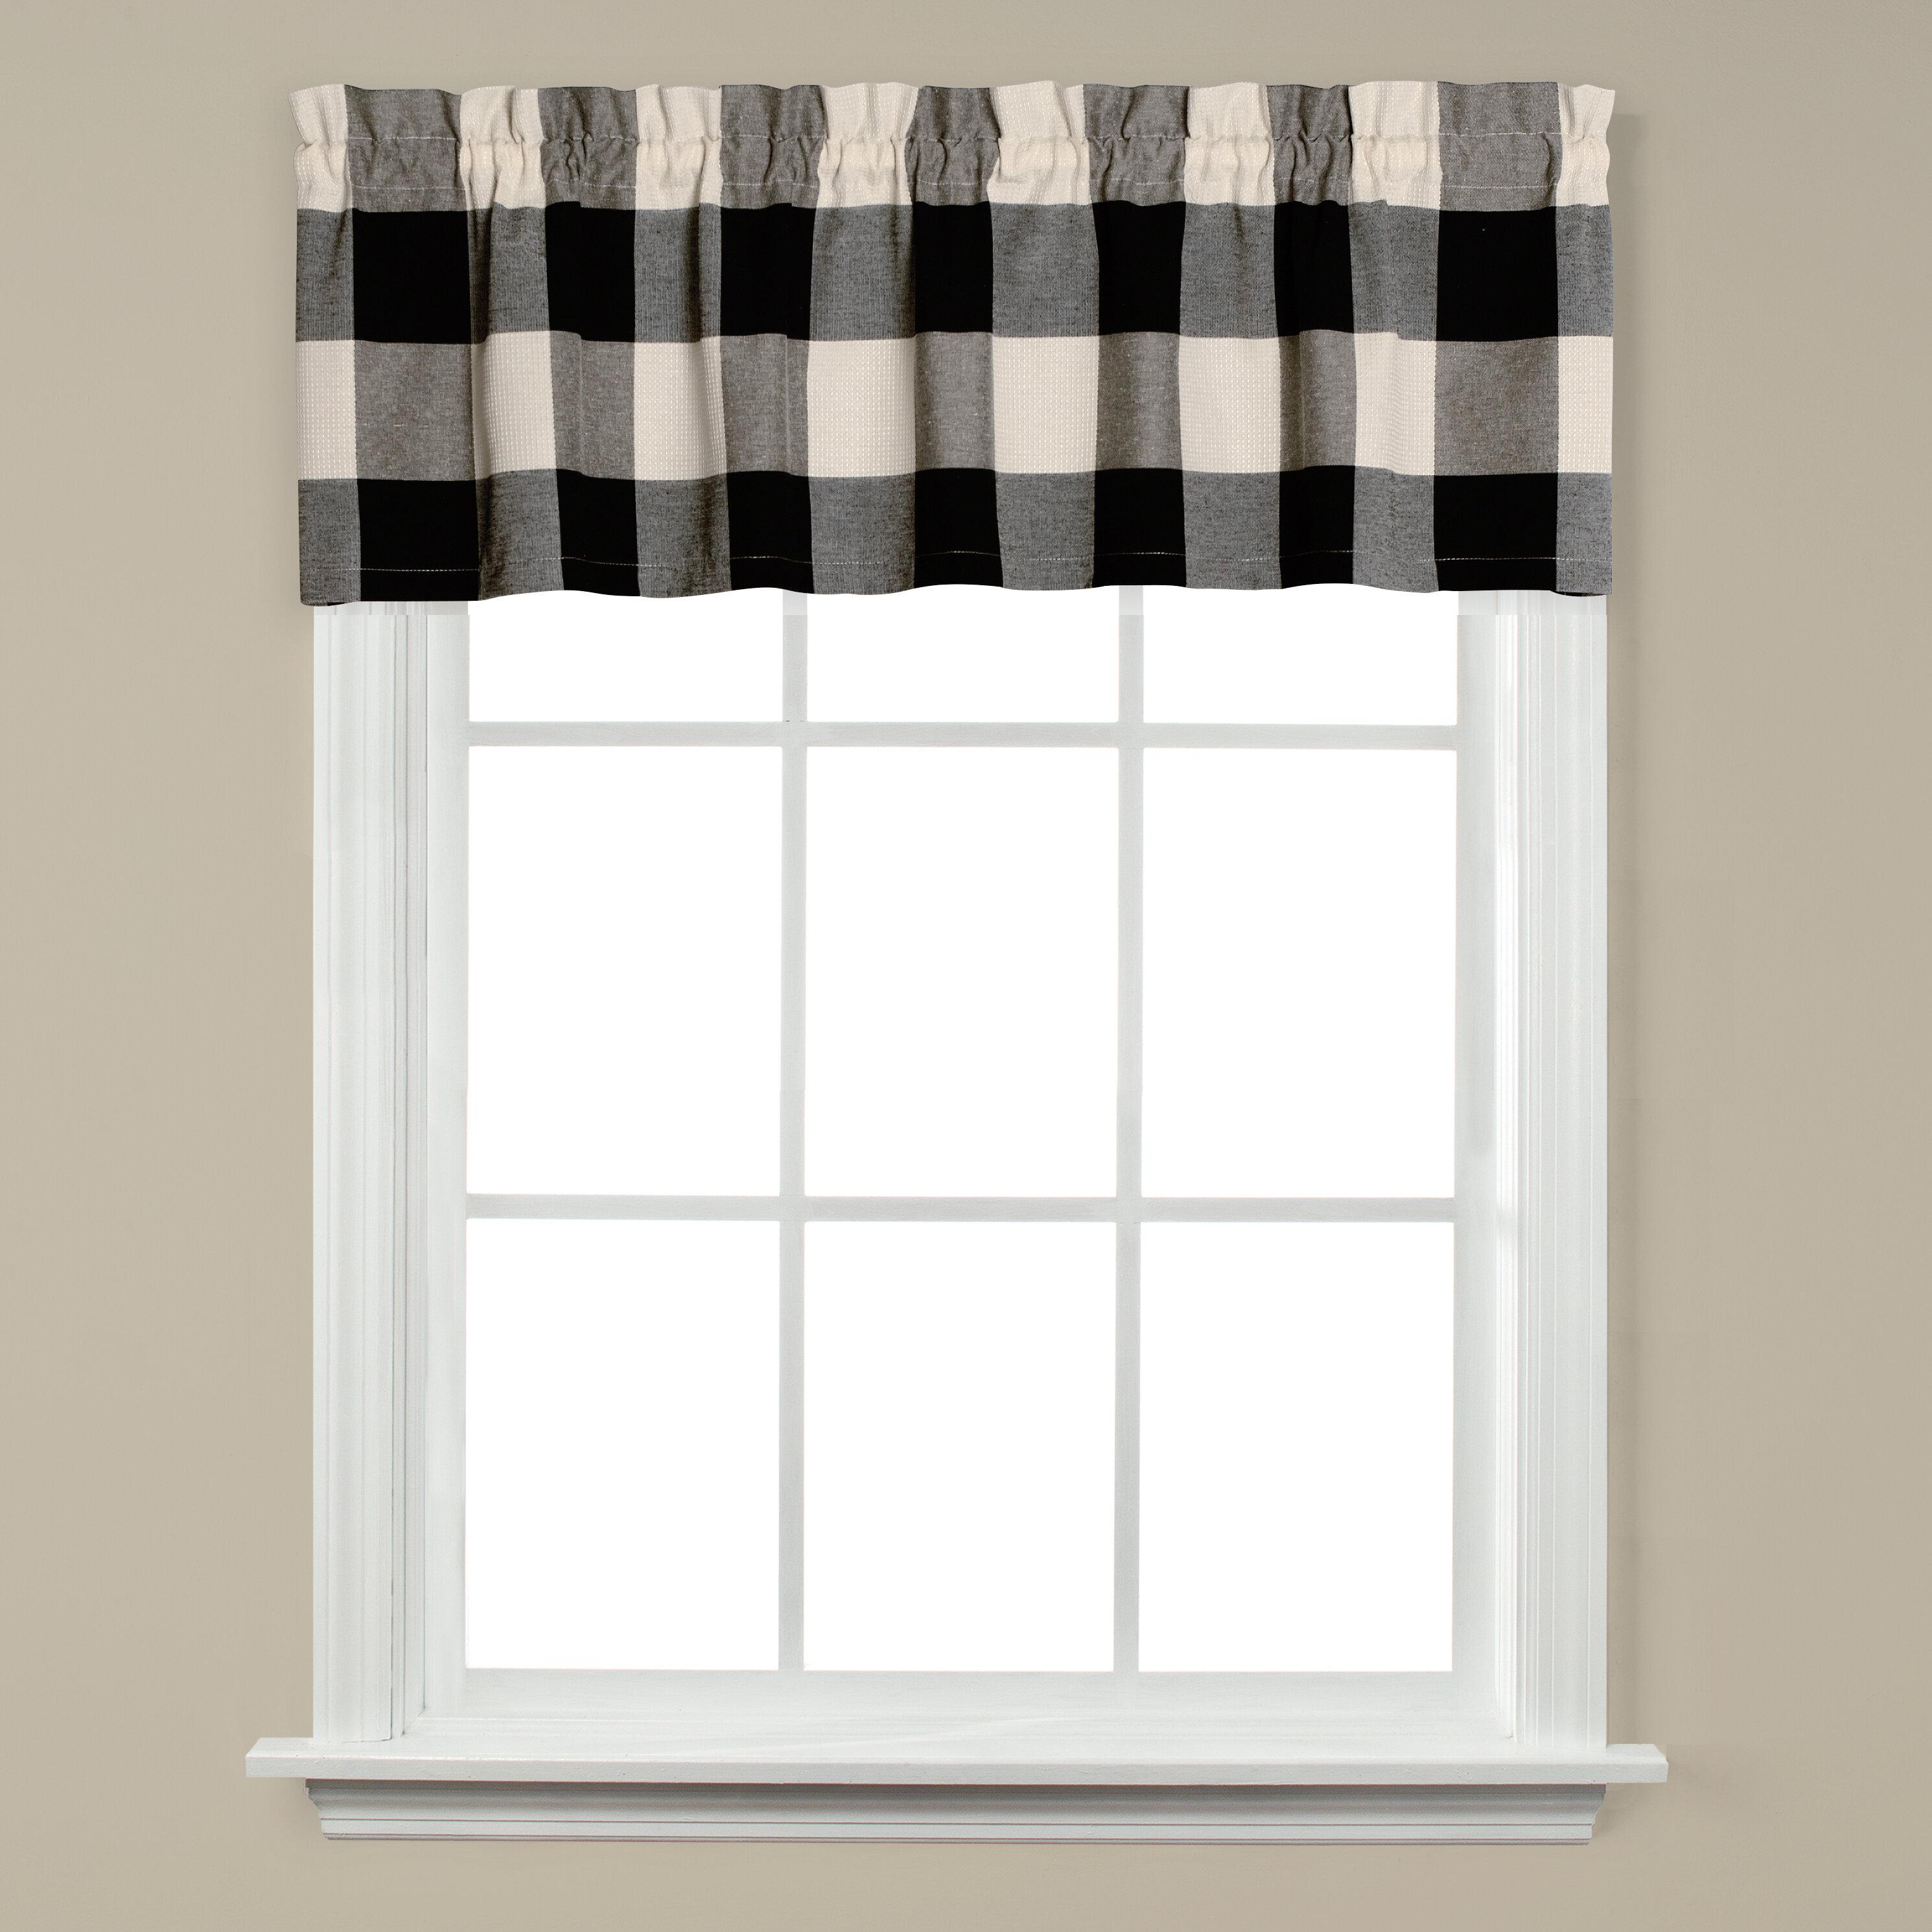 Black Valances Kitchen Curtains You Ll Love In 2021 Wayfair